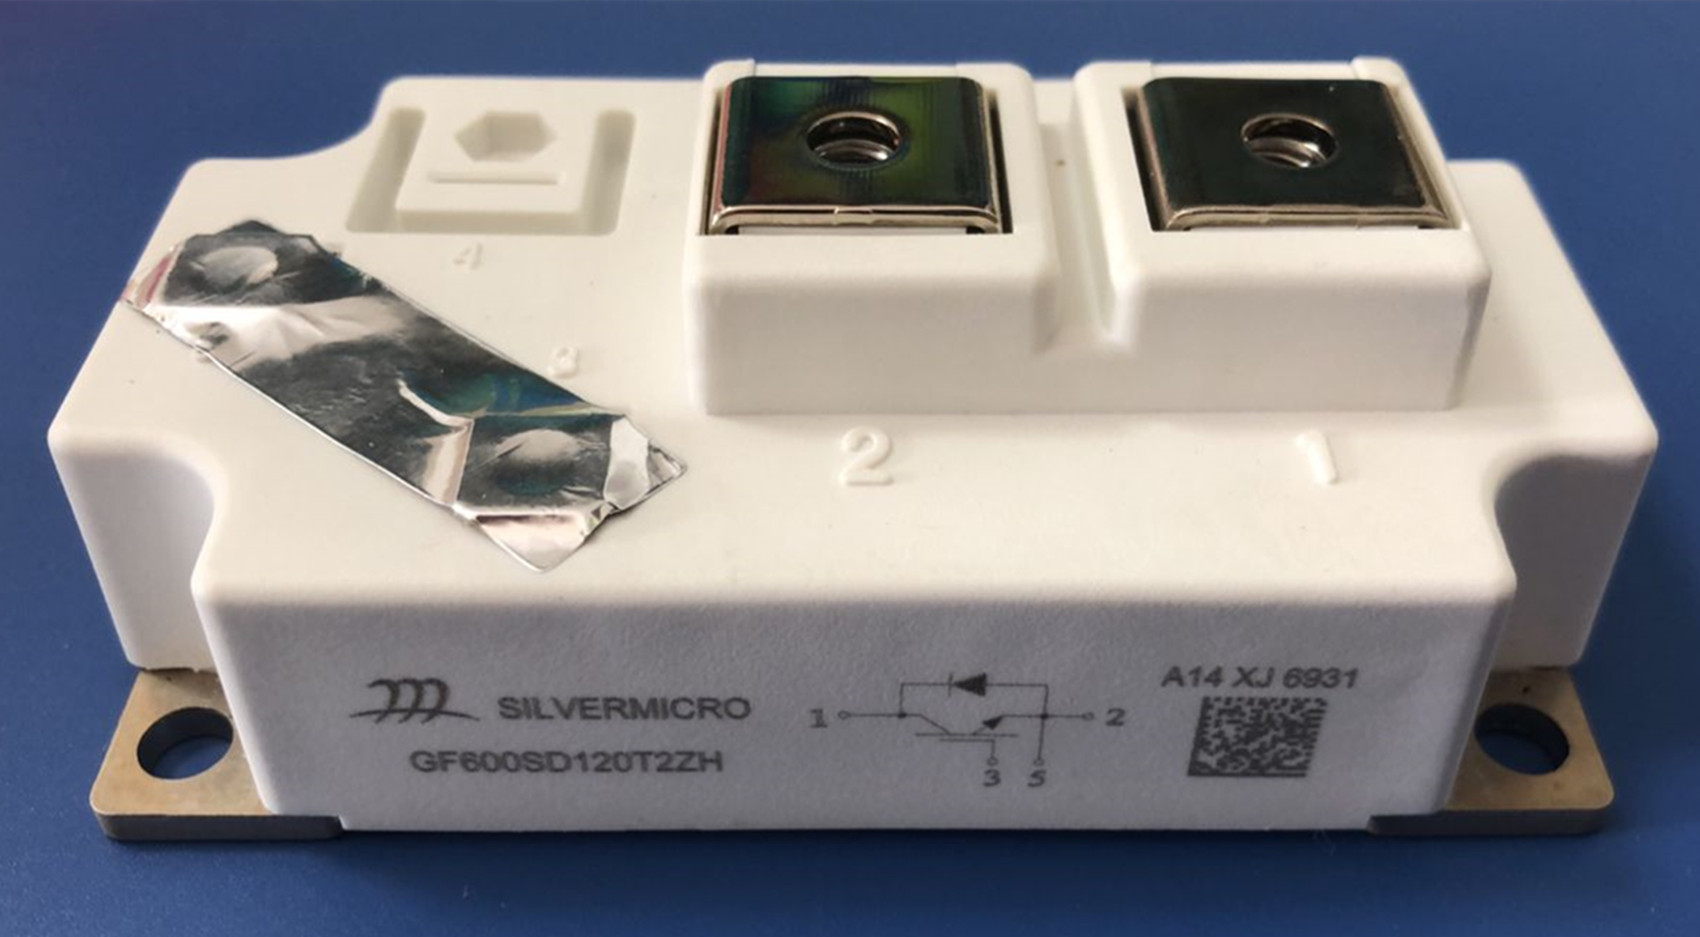 FZ400R12KS4廠家供應-購買銷量好的銀茂微模塊GF600SD120T2ZH優選晟鑫微科技